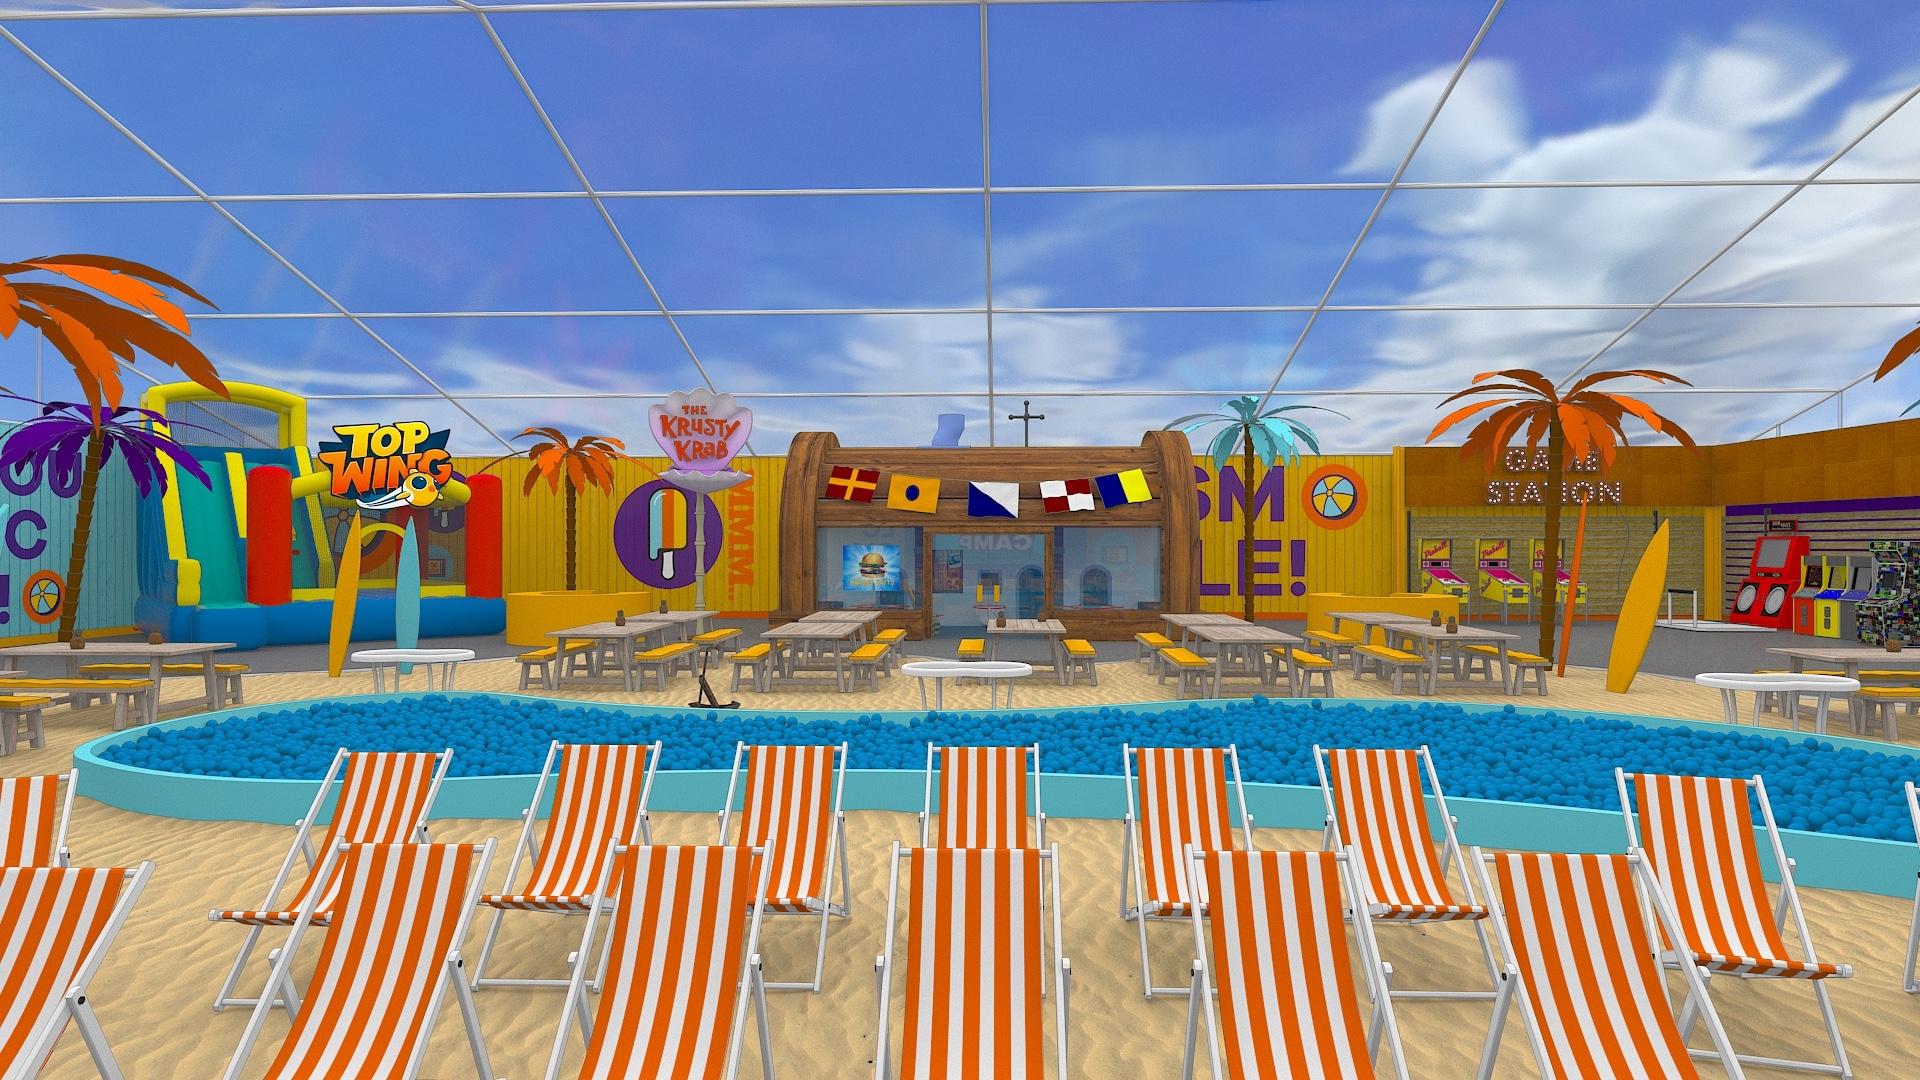 BB Beach camera 4 WIP 161118